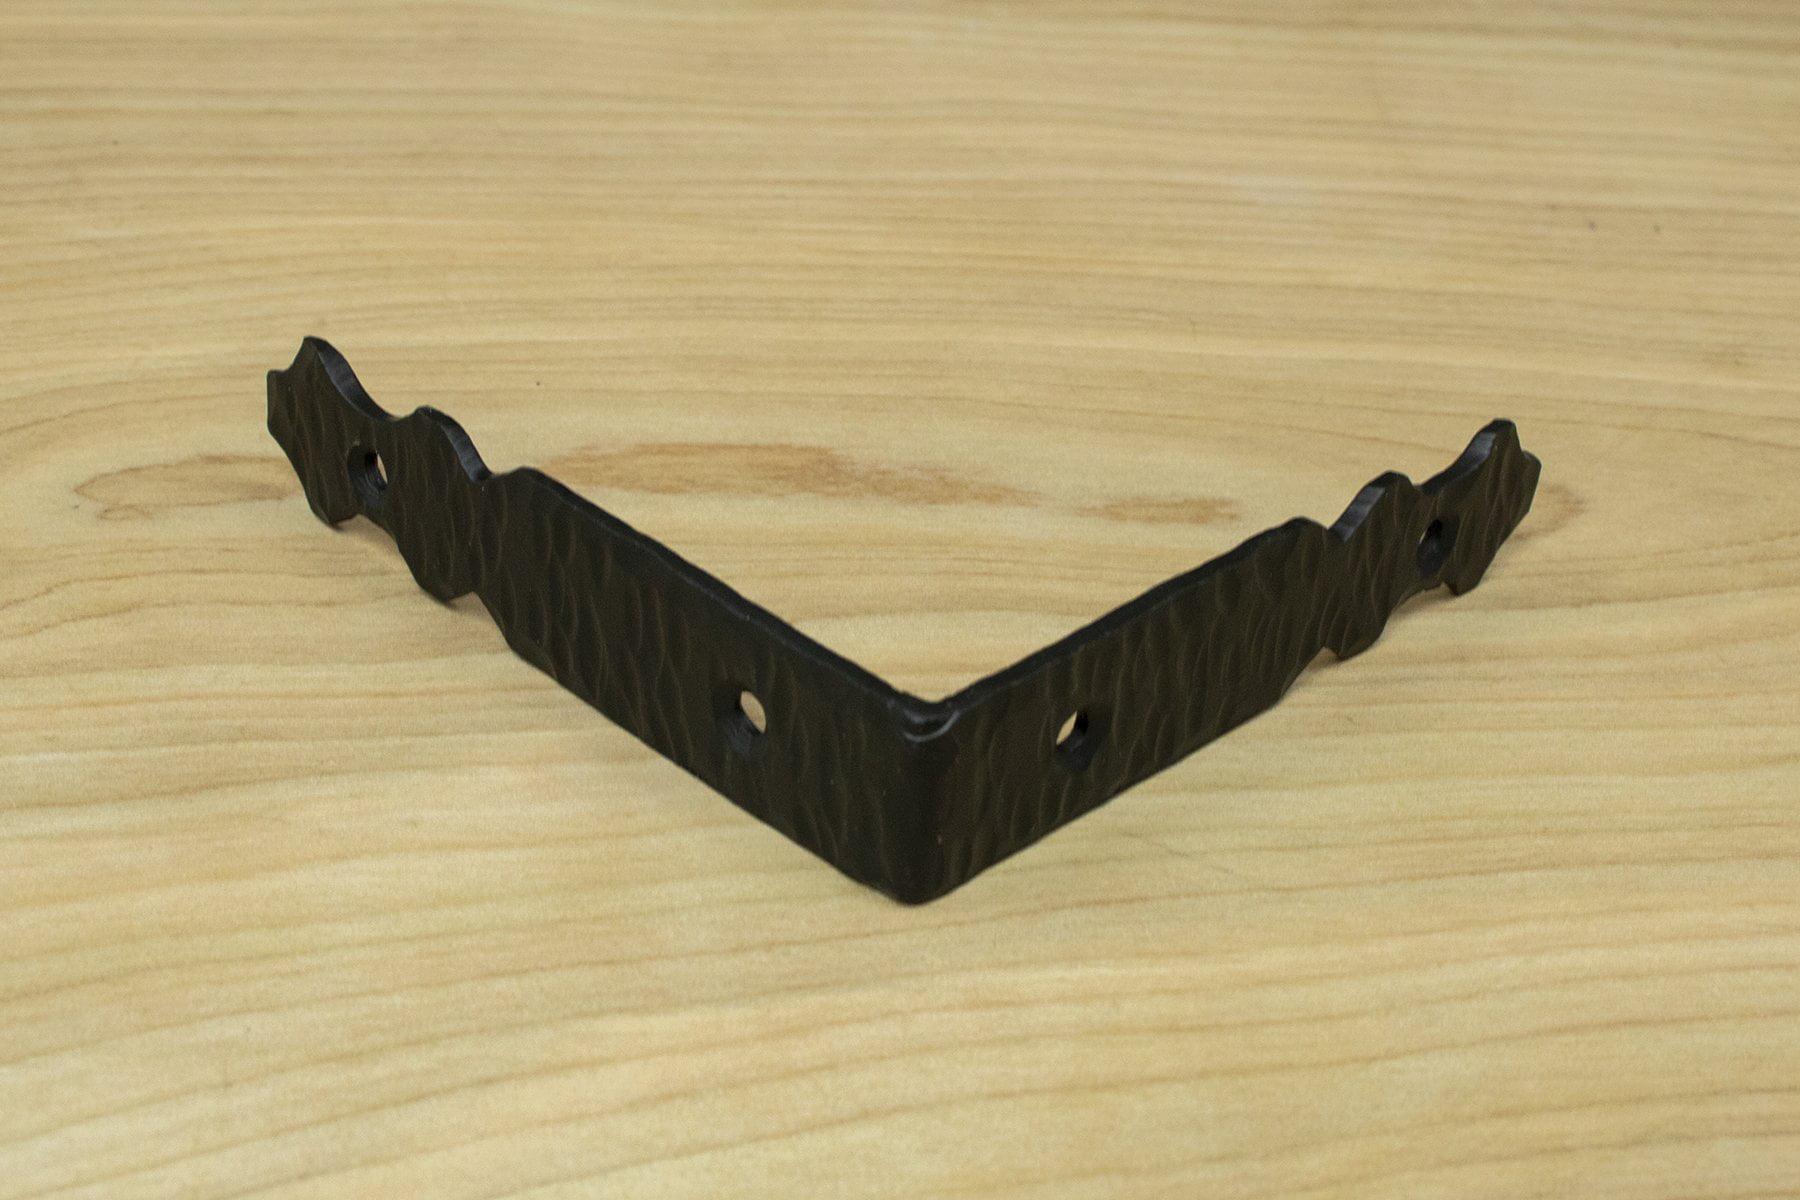 3 75 Spear Corner Bracket Brace For Furniture Rustic Hammered Iron Black Finish Hand Crafted Borderland Hardware